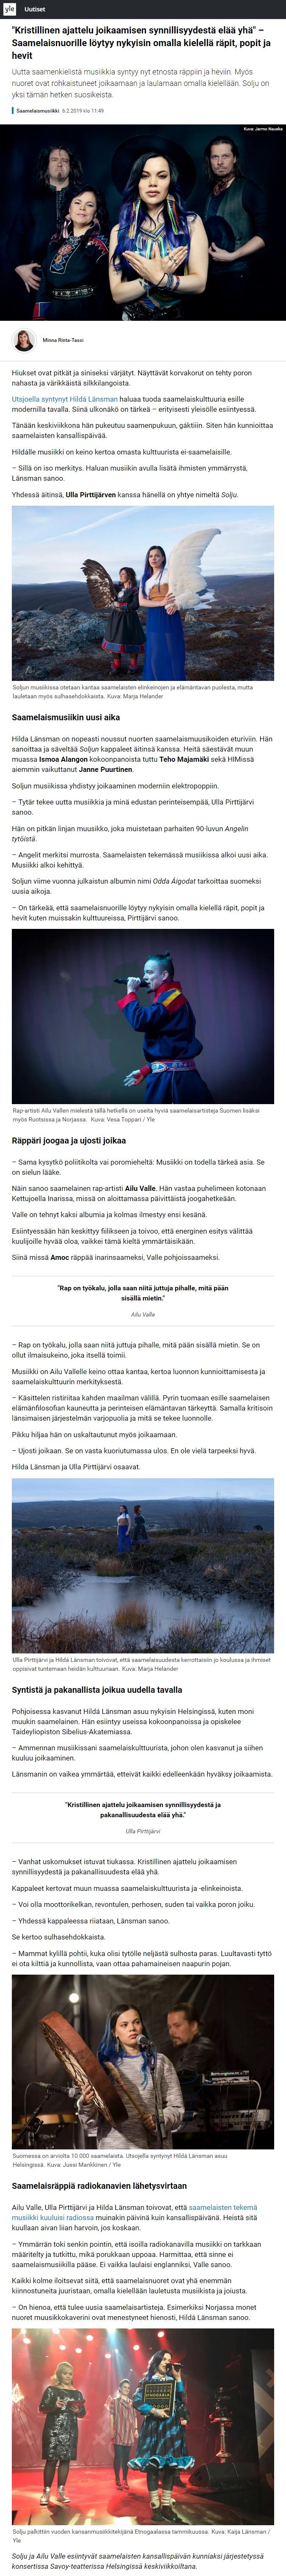 Riffi (Finland,) 22.2.2019